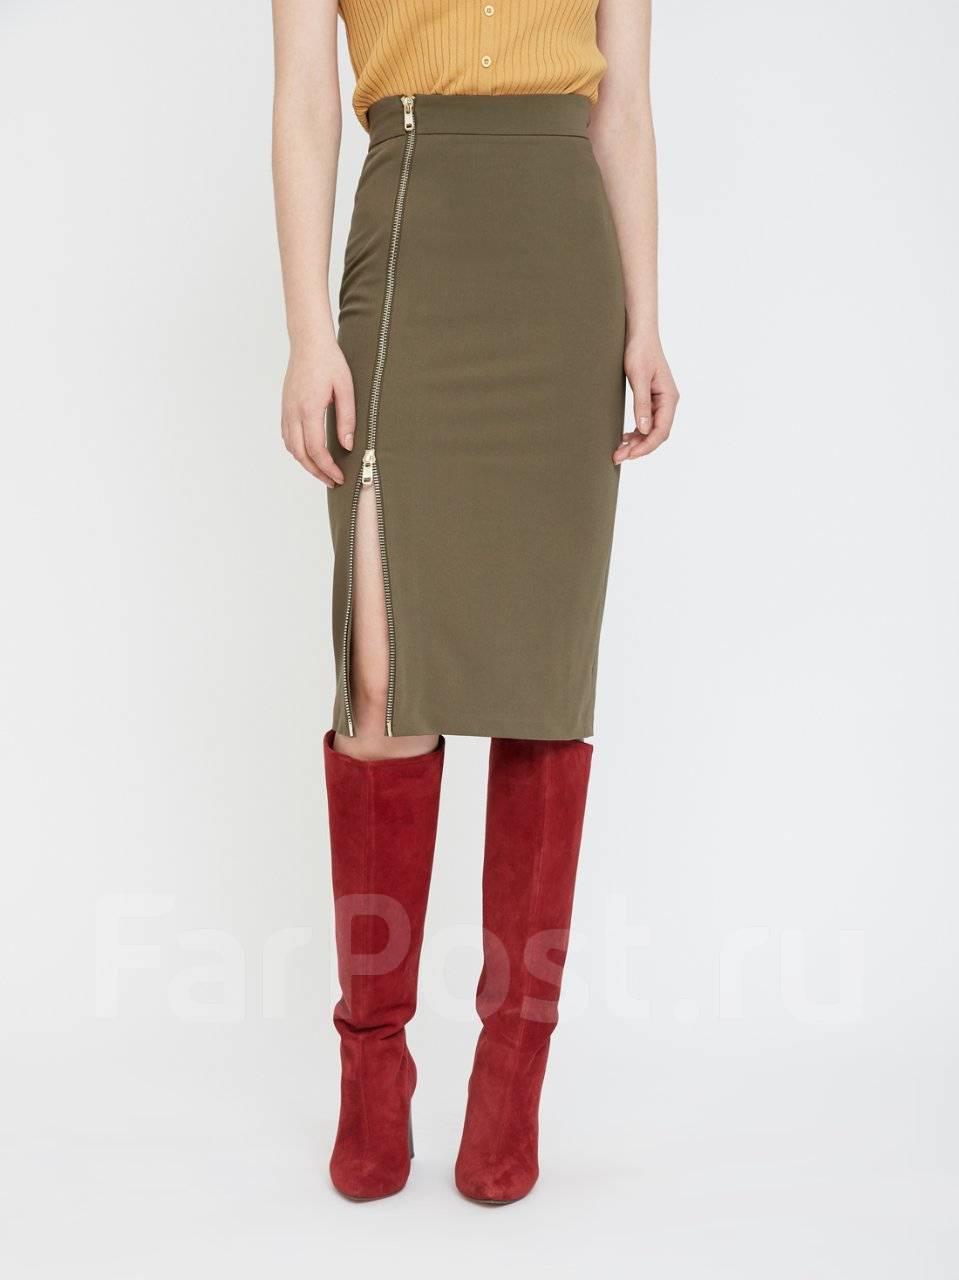 e4bea2d842e Купить женские юбки-карандаши Размер  44 размера во Владивостоке! Цены.